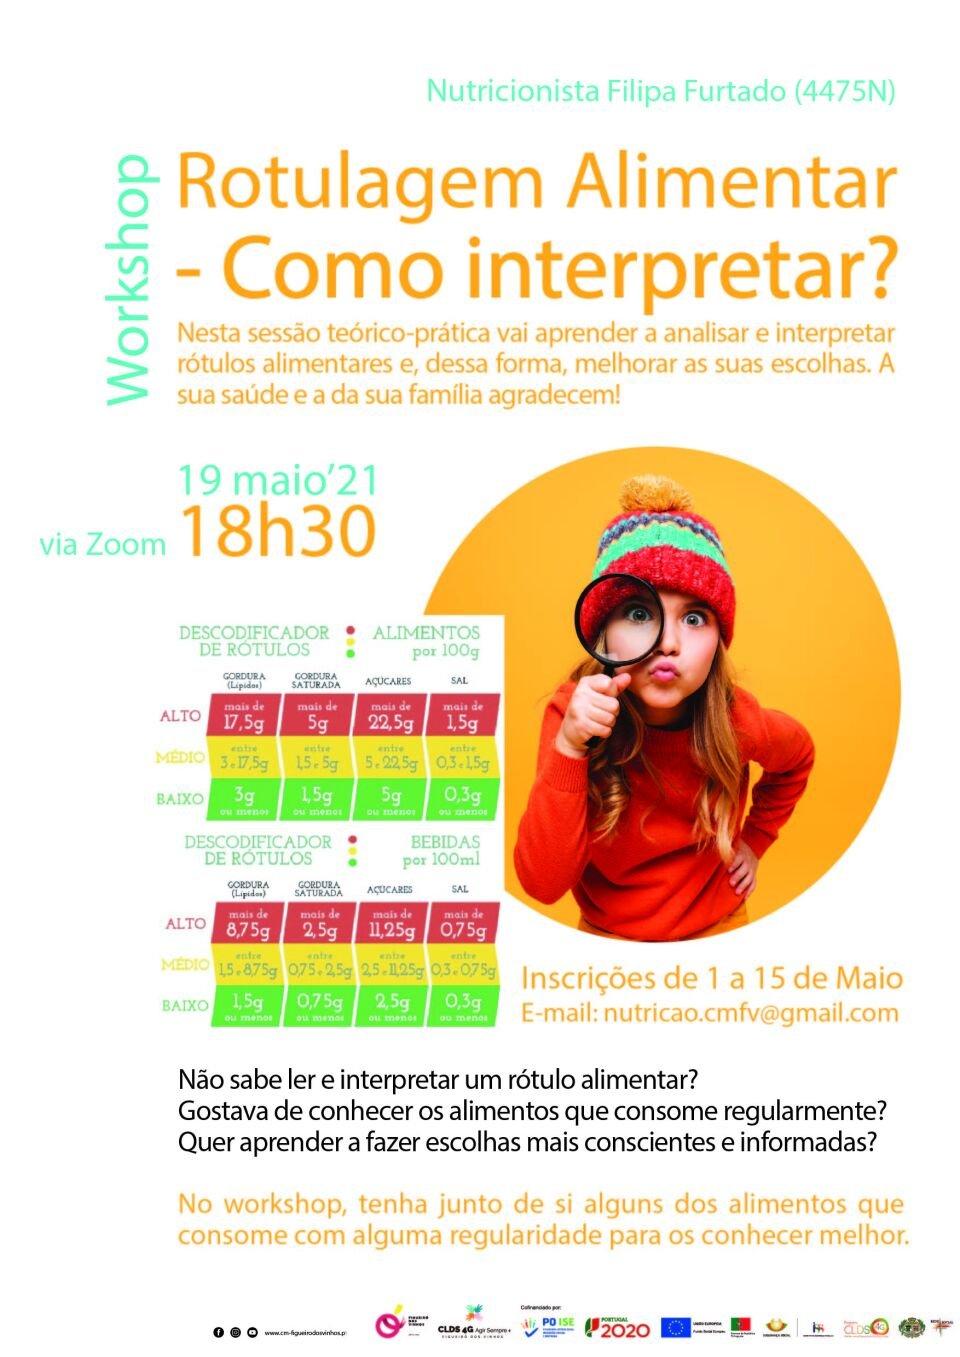 Workshop - Rotulagem Alimentar - Como Interpretar?